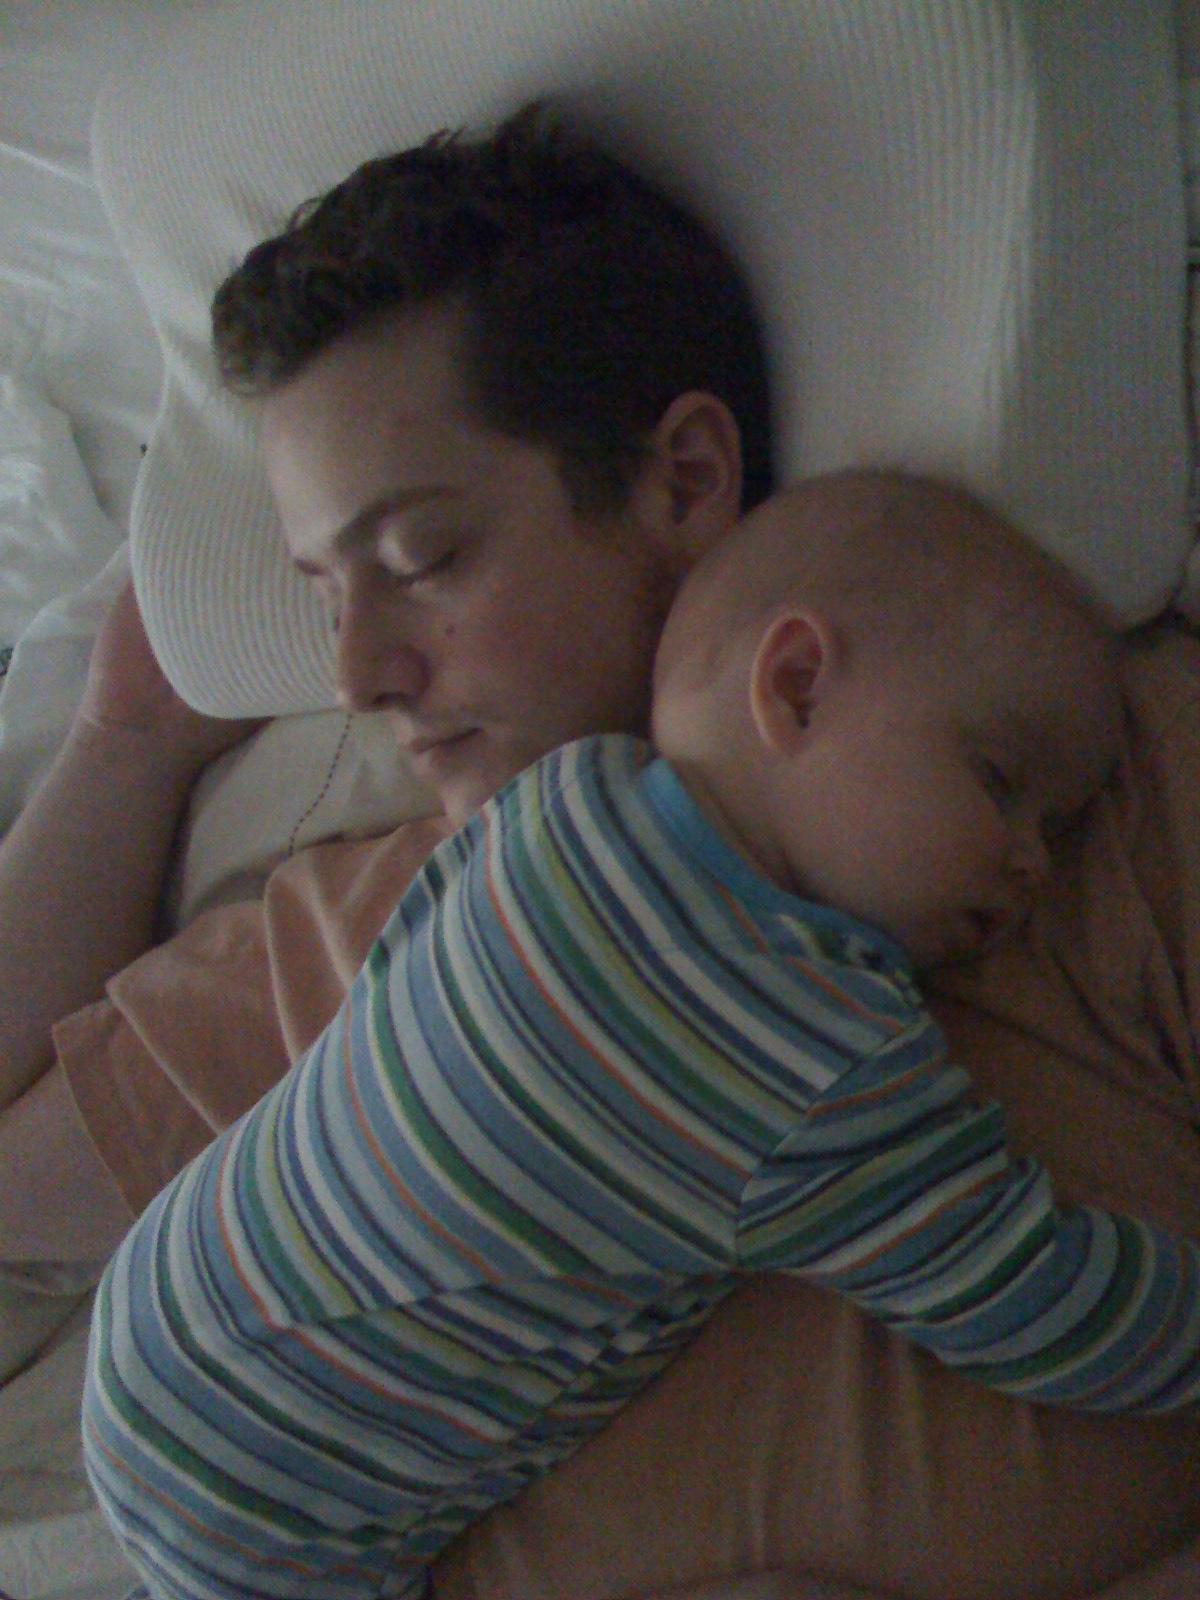 shhhh dan and kivrin are sleeping